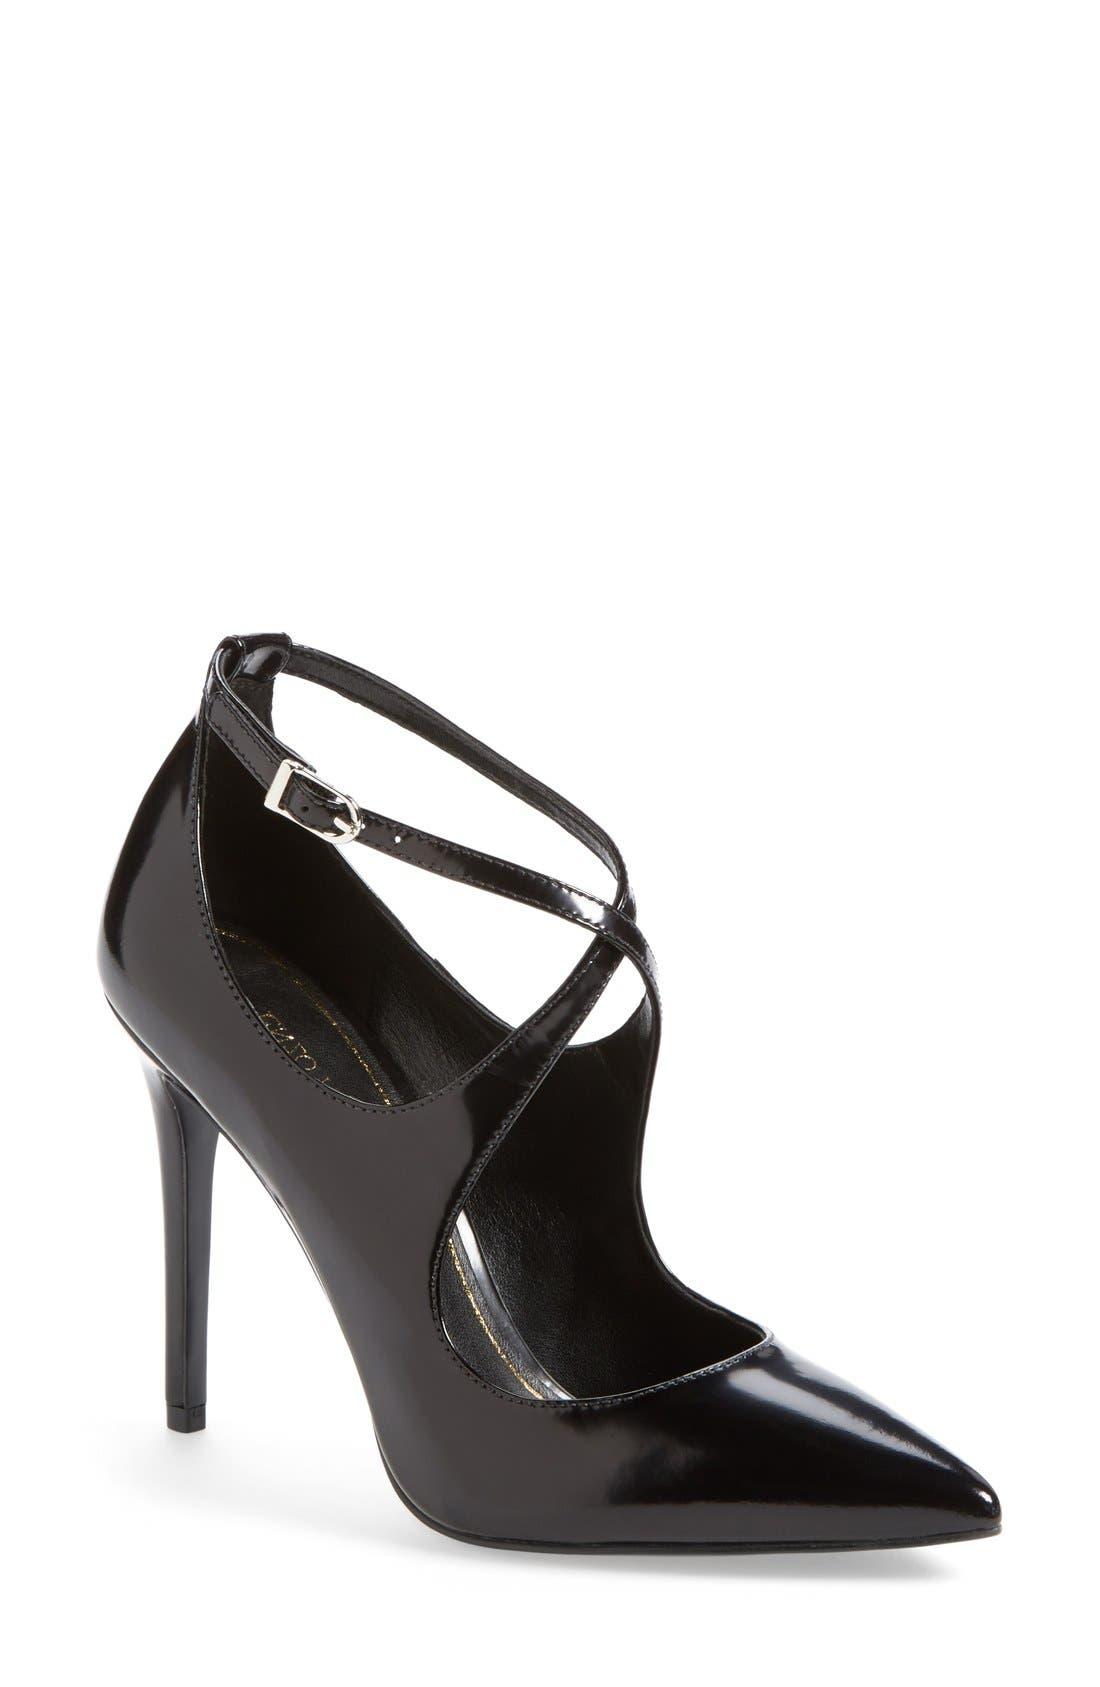 Main Image - Enzo Angiolini 'Finton' Leather Pointy Toe Pump (Women)